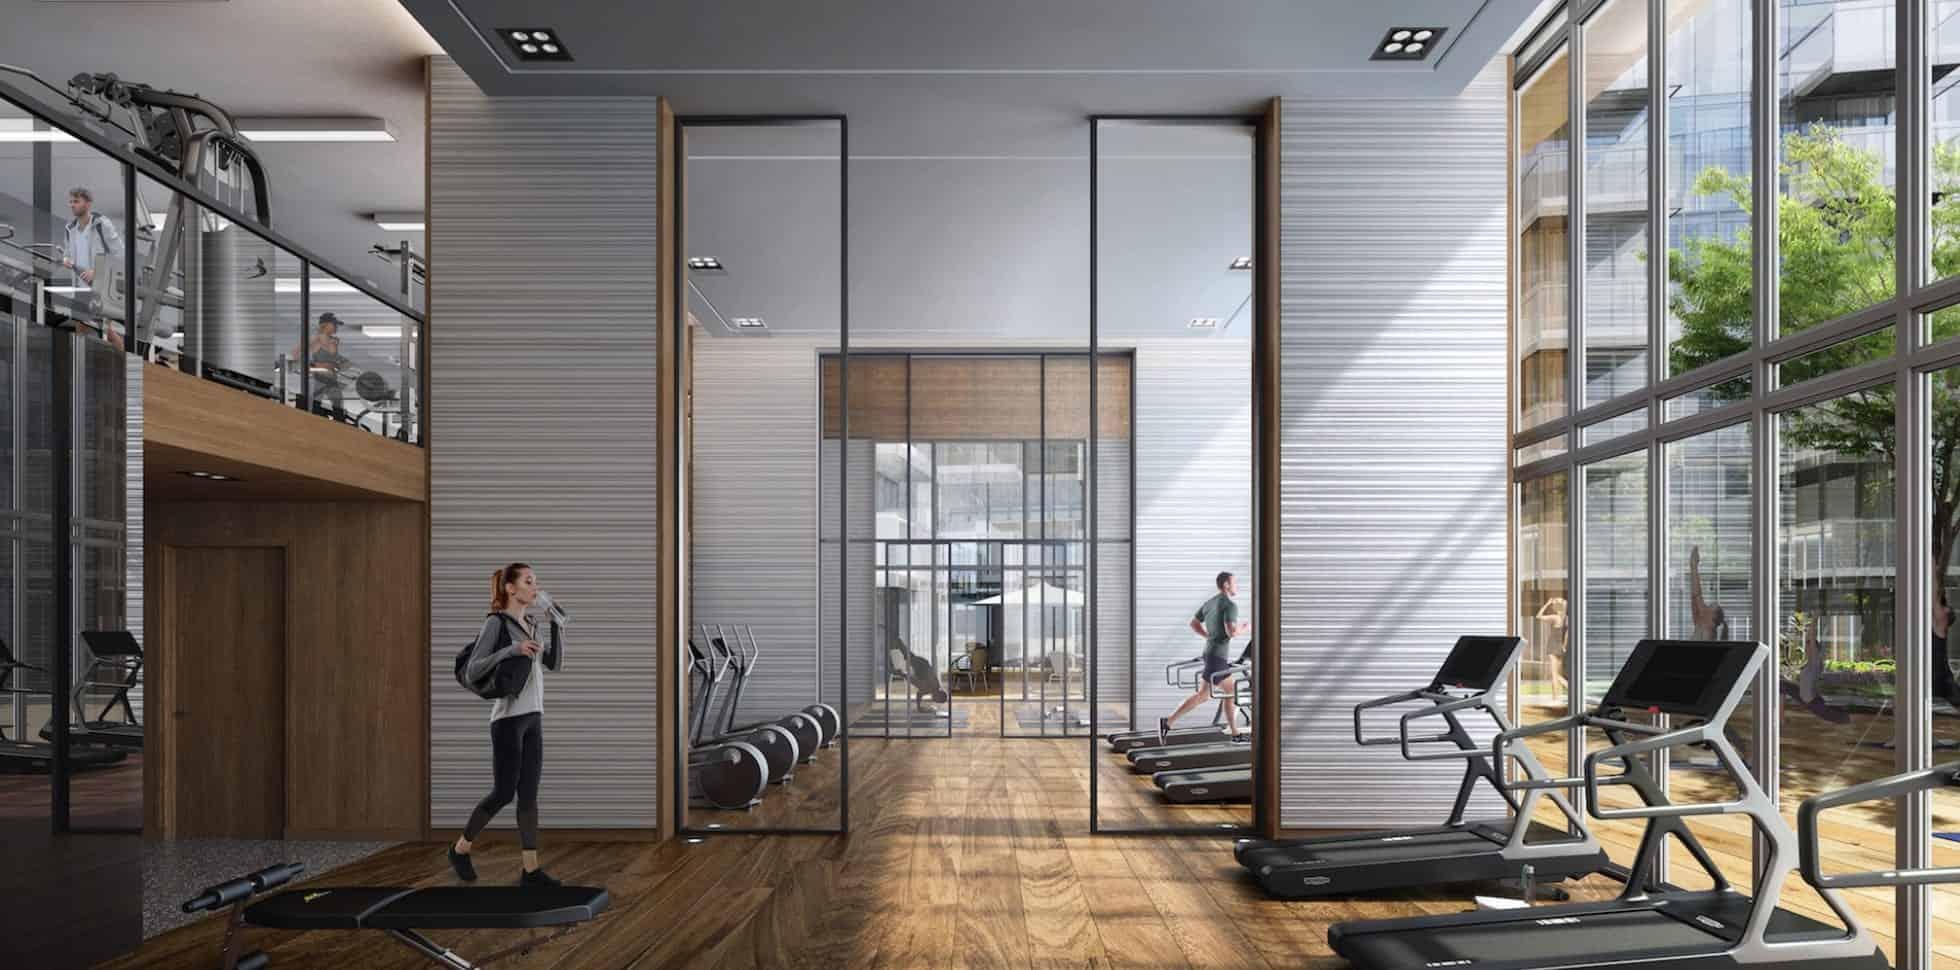 T1 at M2M Condos Gym Fitness True Condos